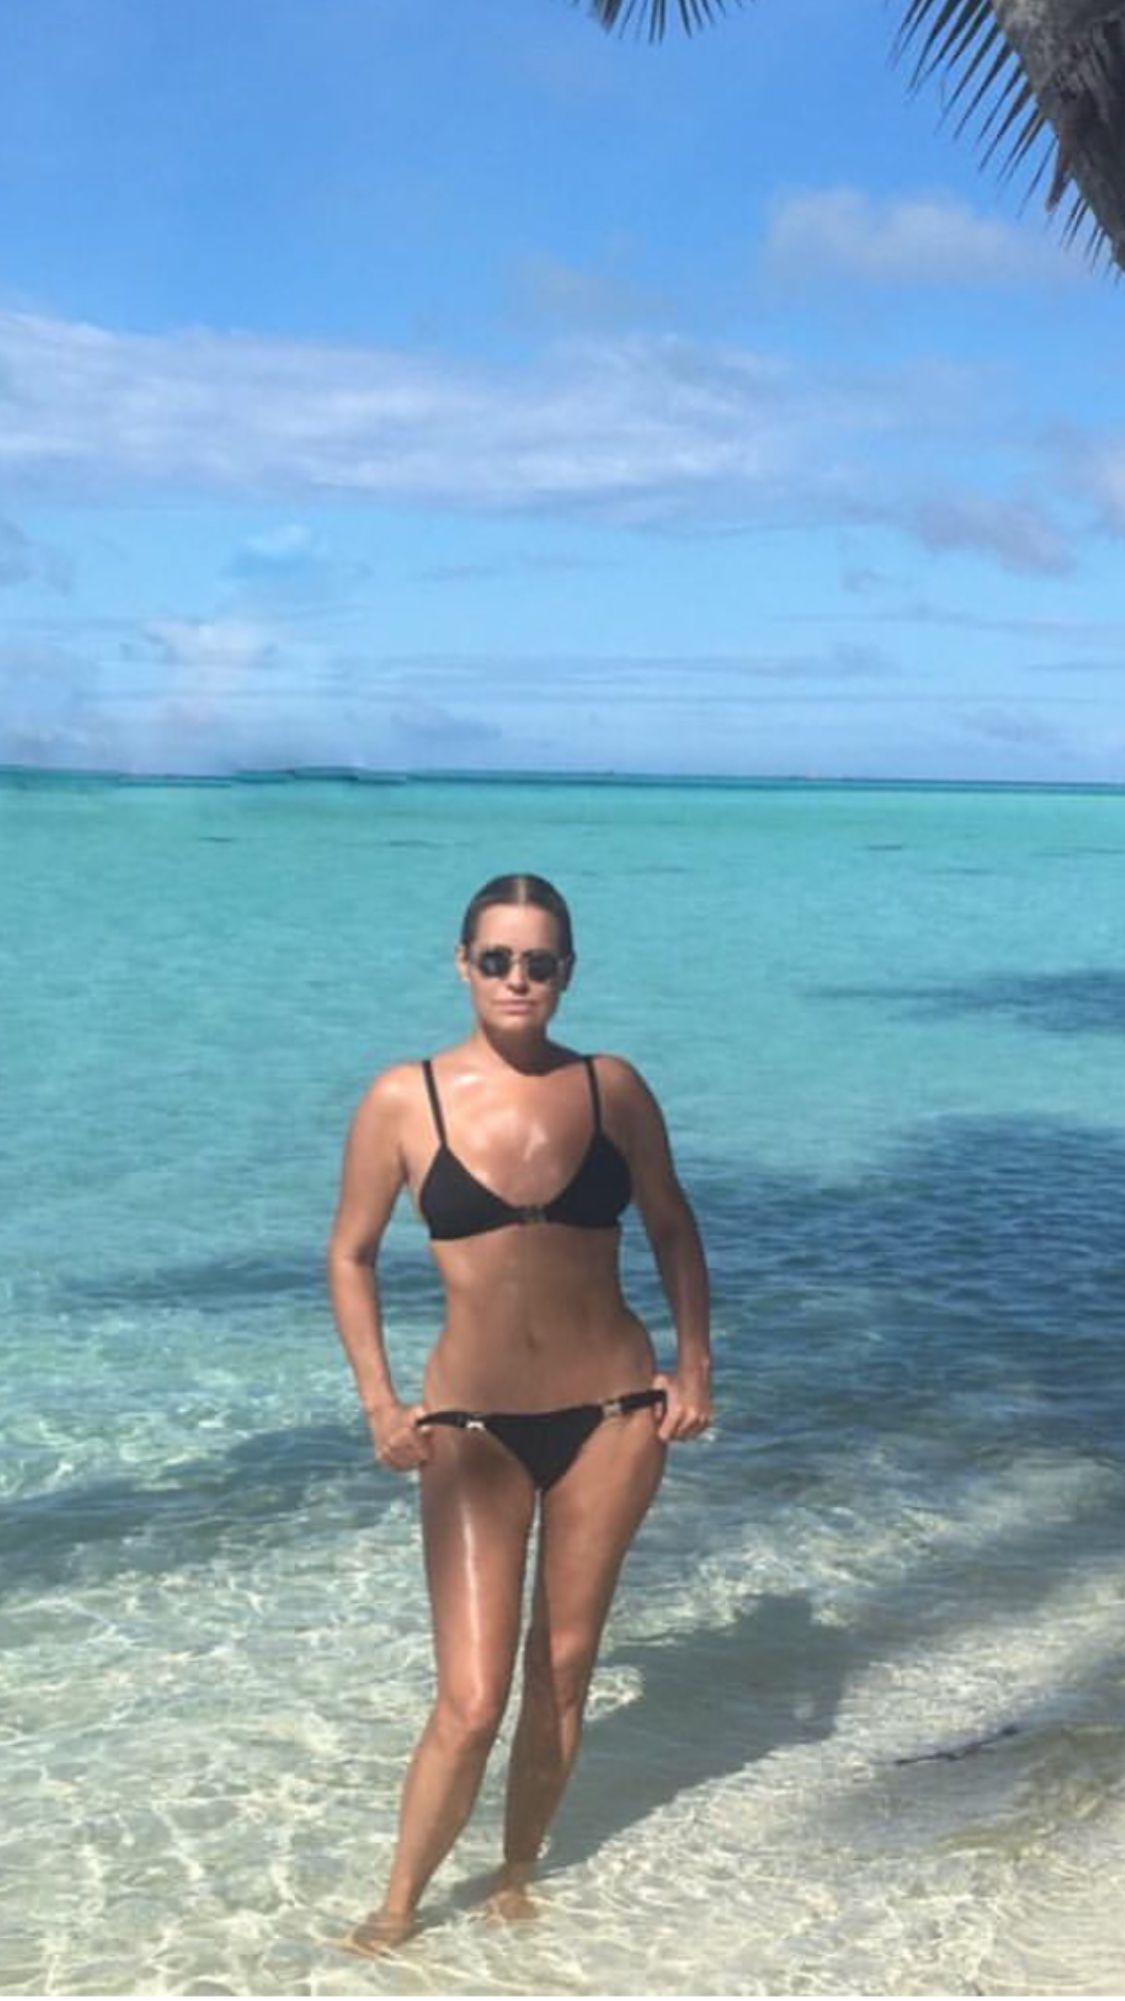 Sexy Yolanda Hadid nudes (29 photo), Sexy, Sideboobs, Instagram, braless 2015